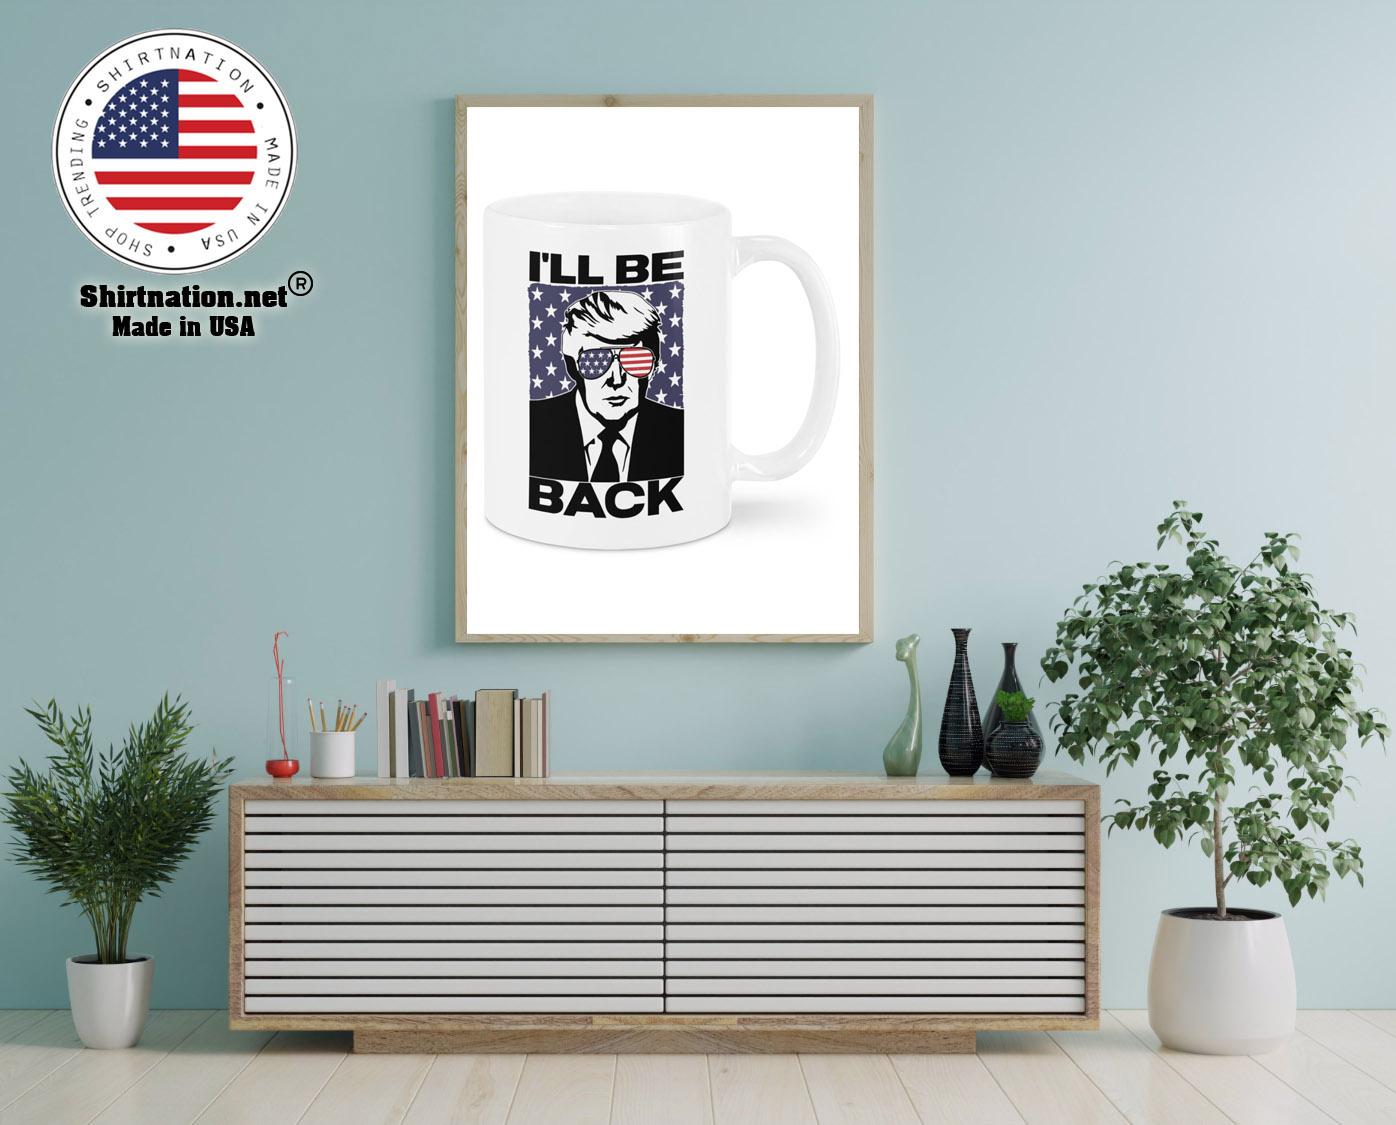 Ill be back Donald Trump mug 12